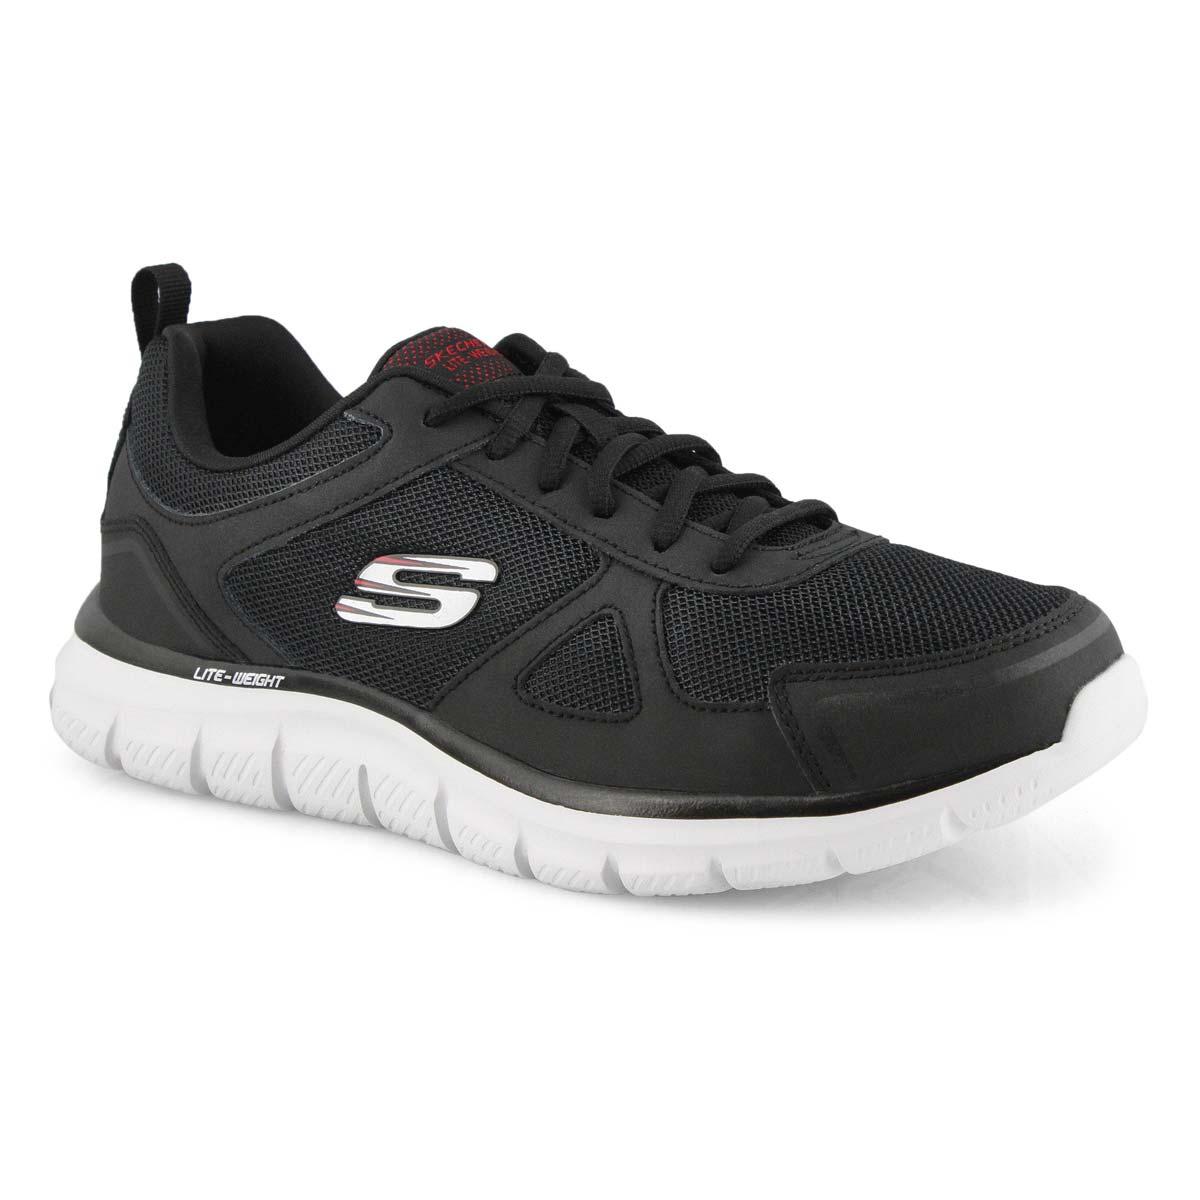 Men's Track Scloric Sneakers Wide - Black/Red